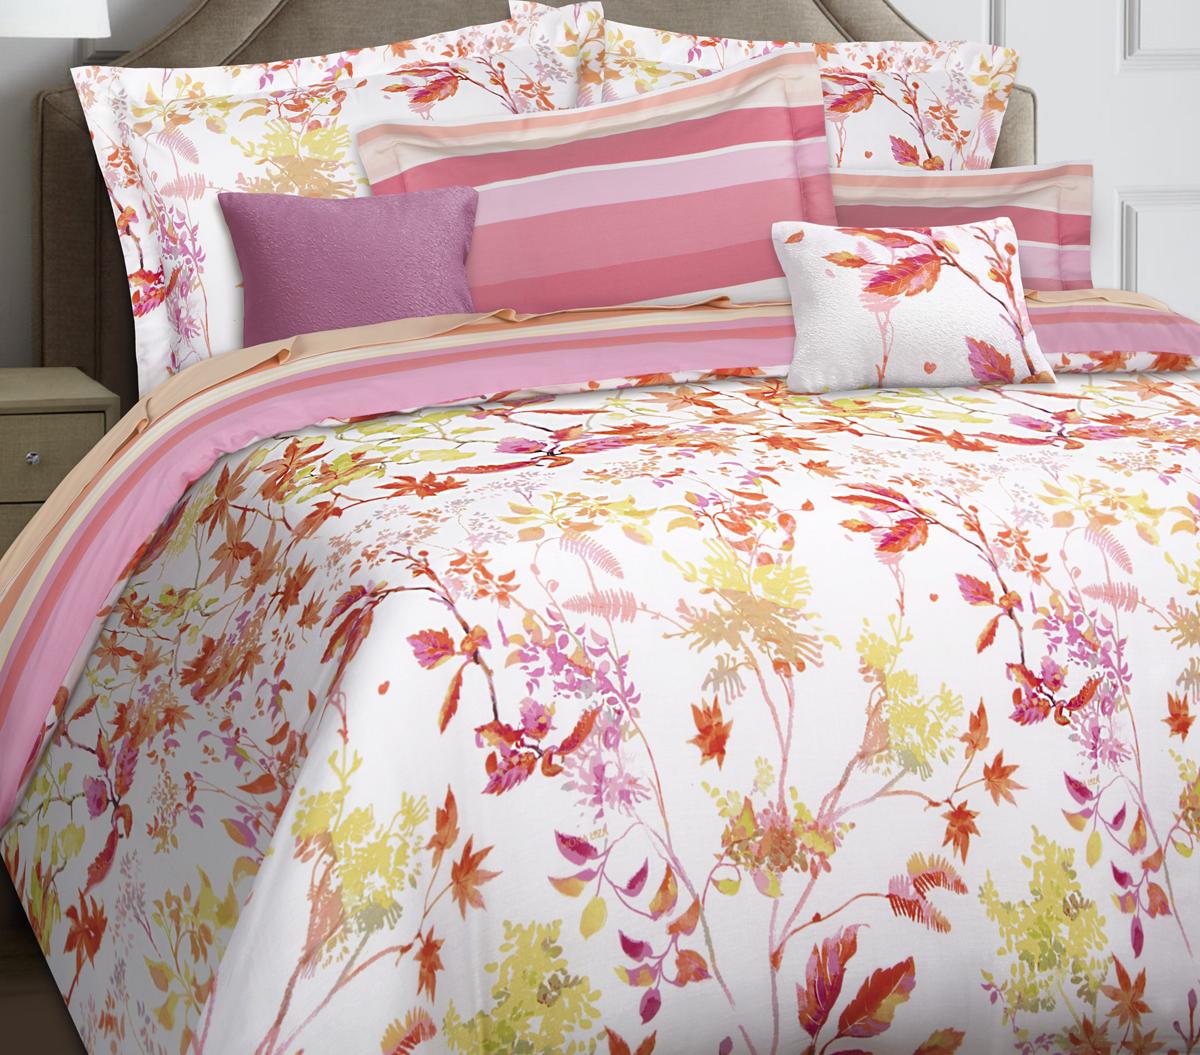 Комплект белья Mona Liza Premium Atelier 4 Seasons, евро, наволочки 50х70, 70х70. 5049-001 комплект полутораспальный mona liza nensy